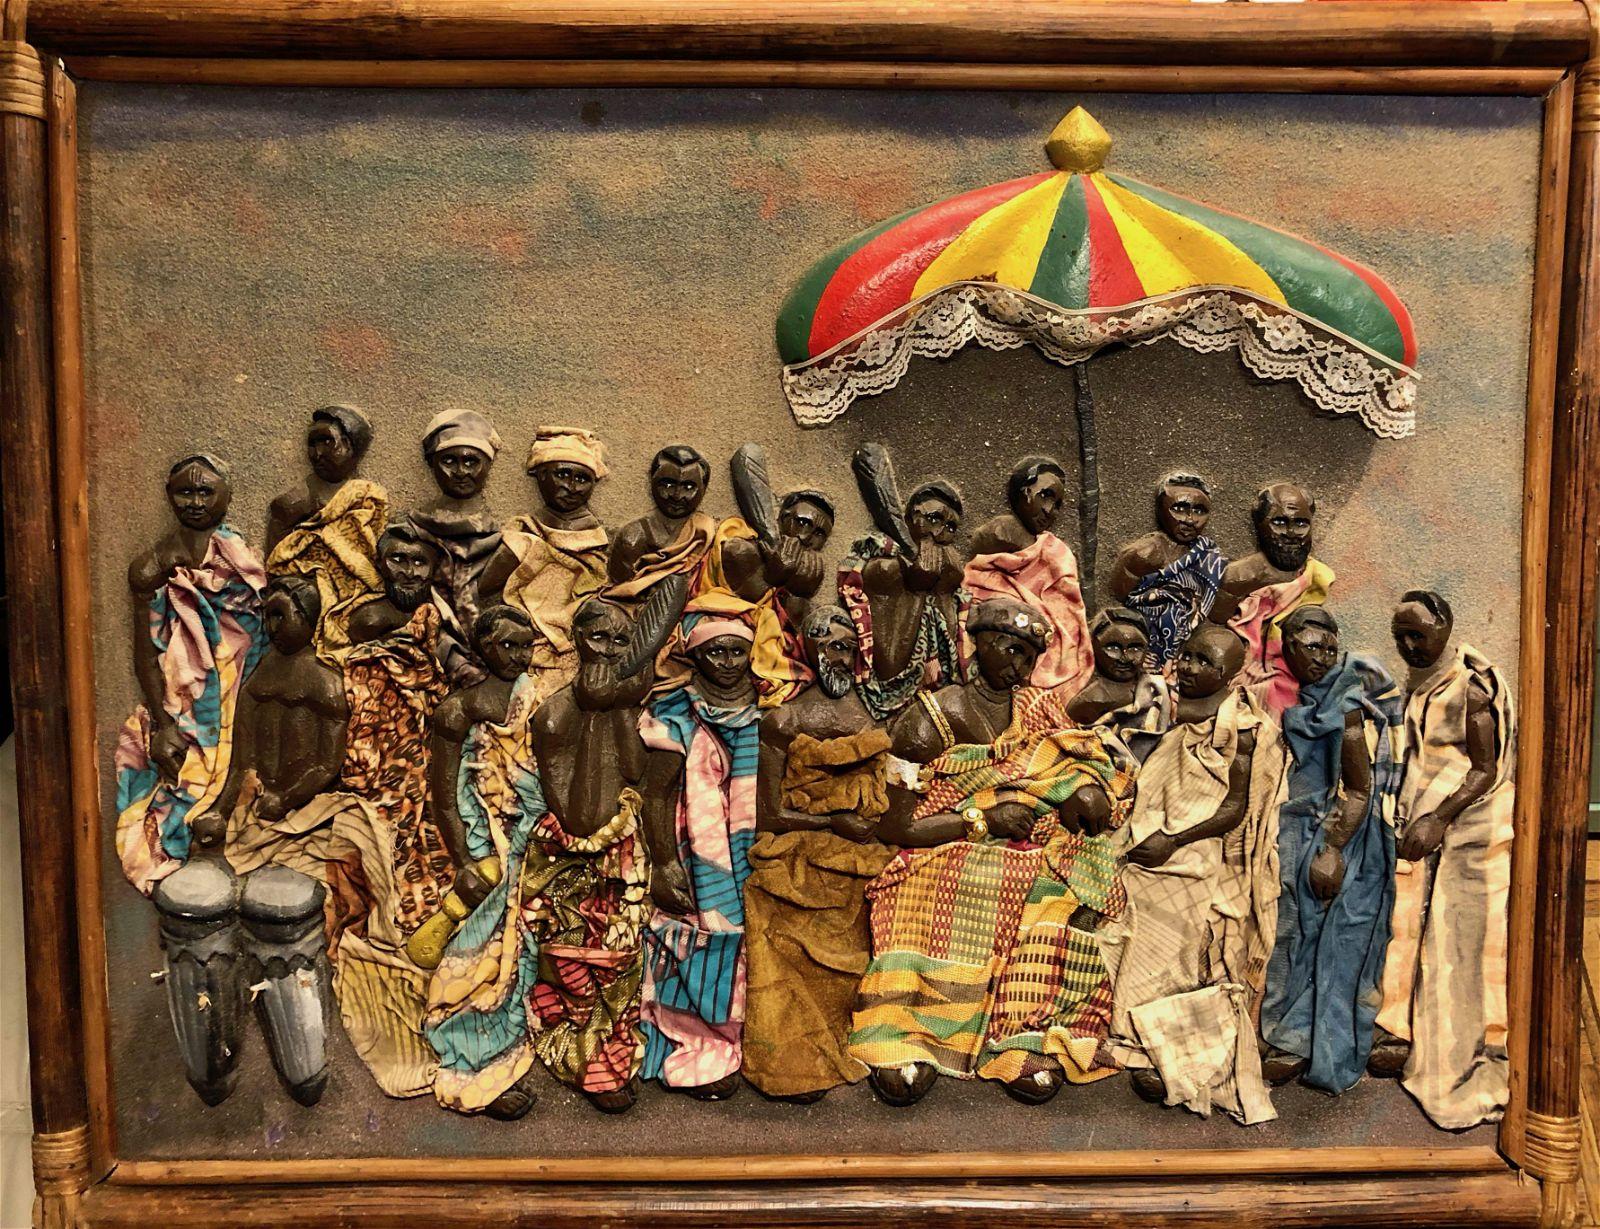 Guyana Folk Art Painted Wood Carving w/ Textile c.1960s